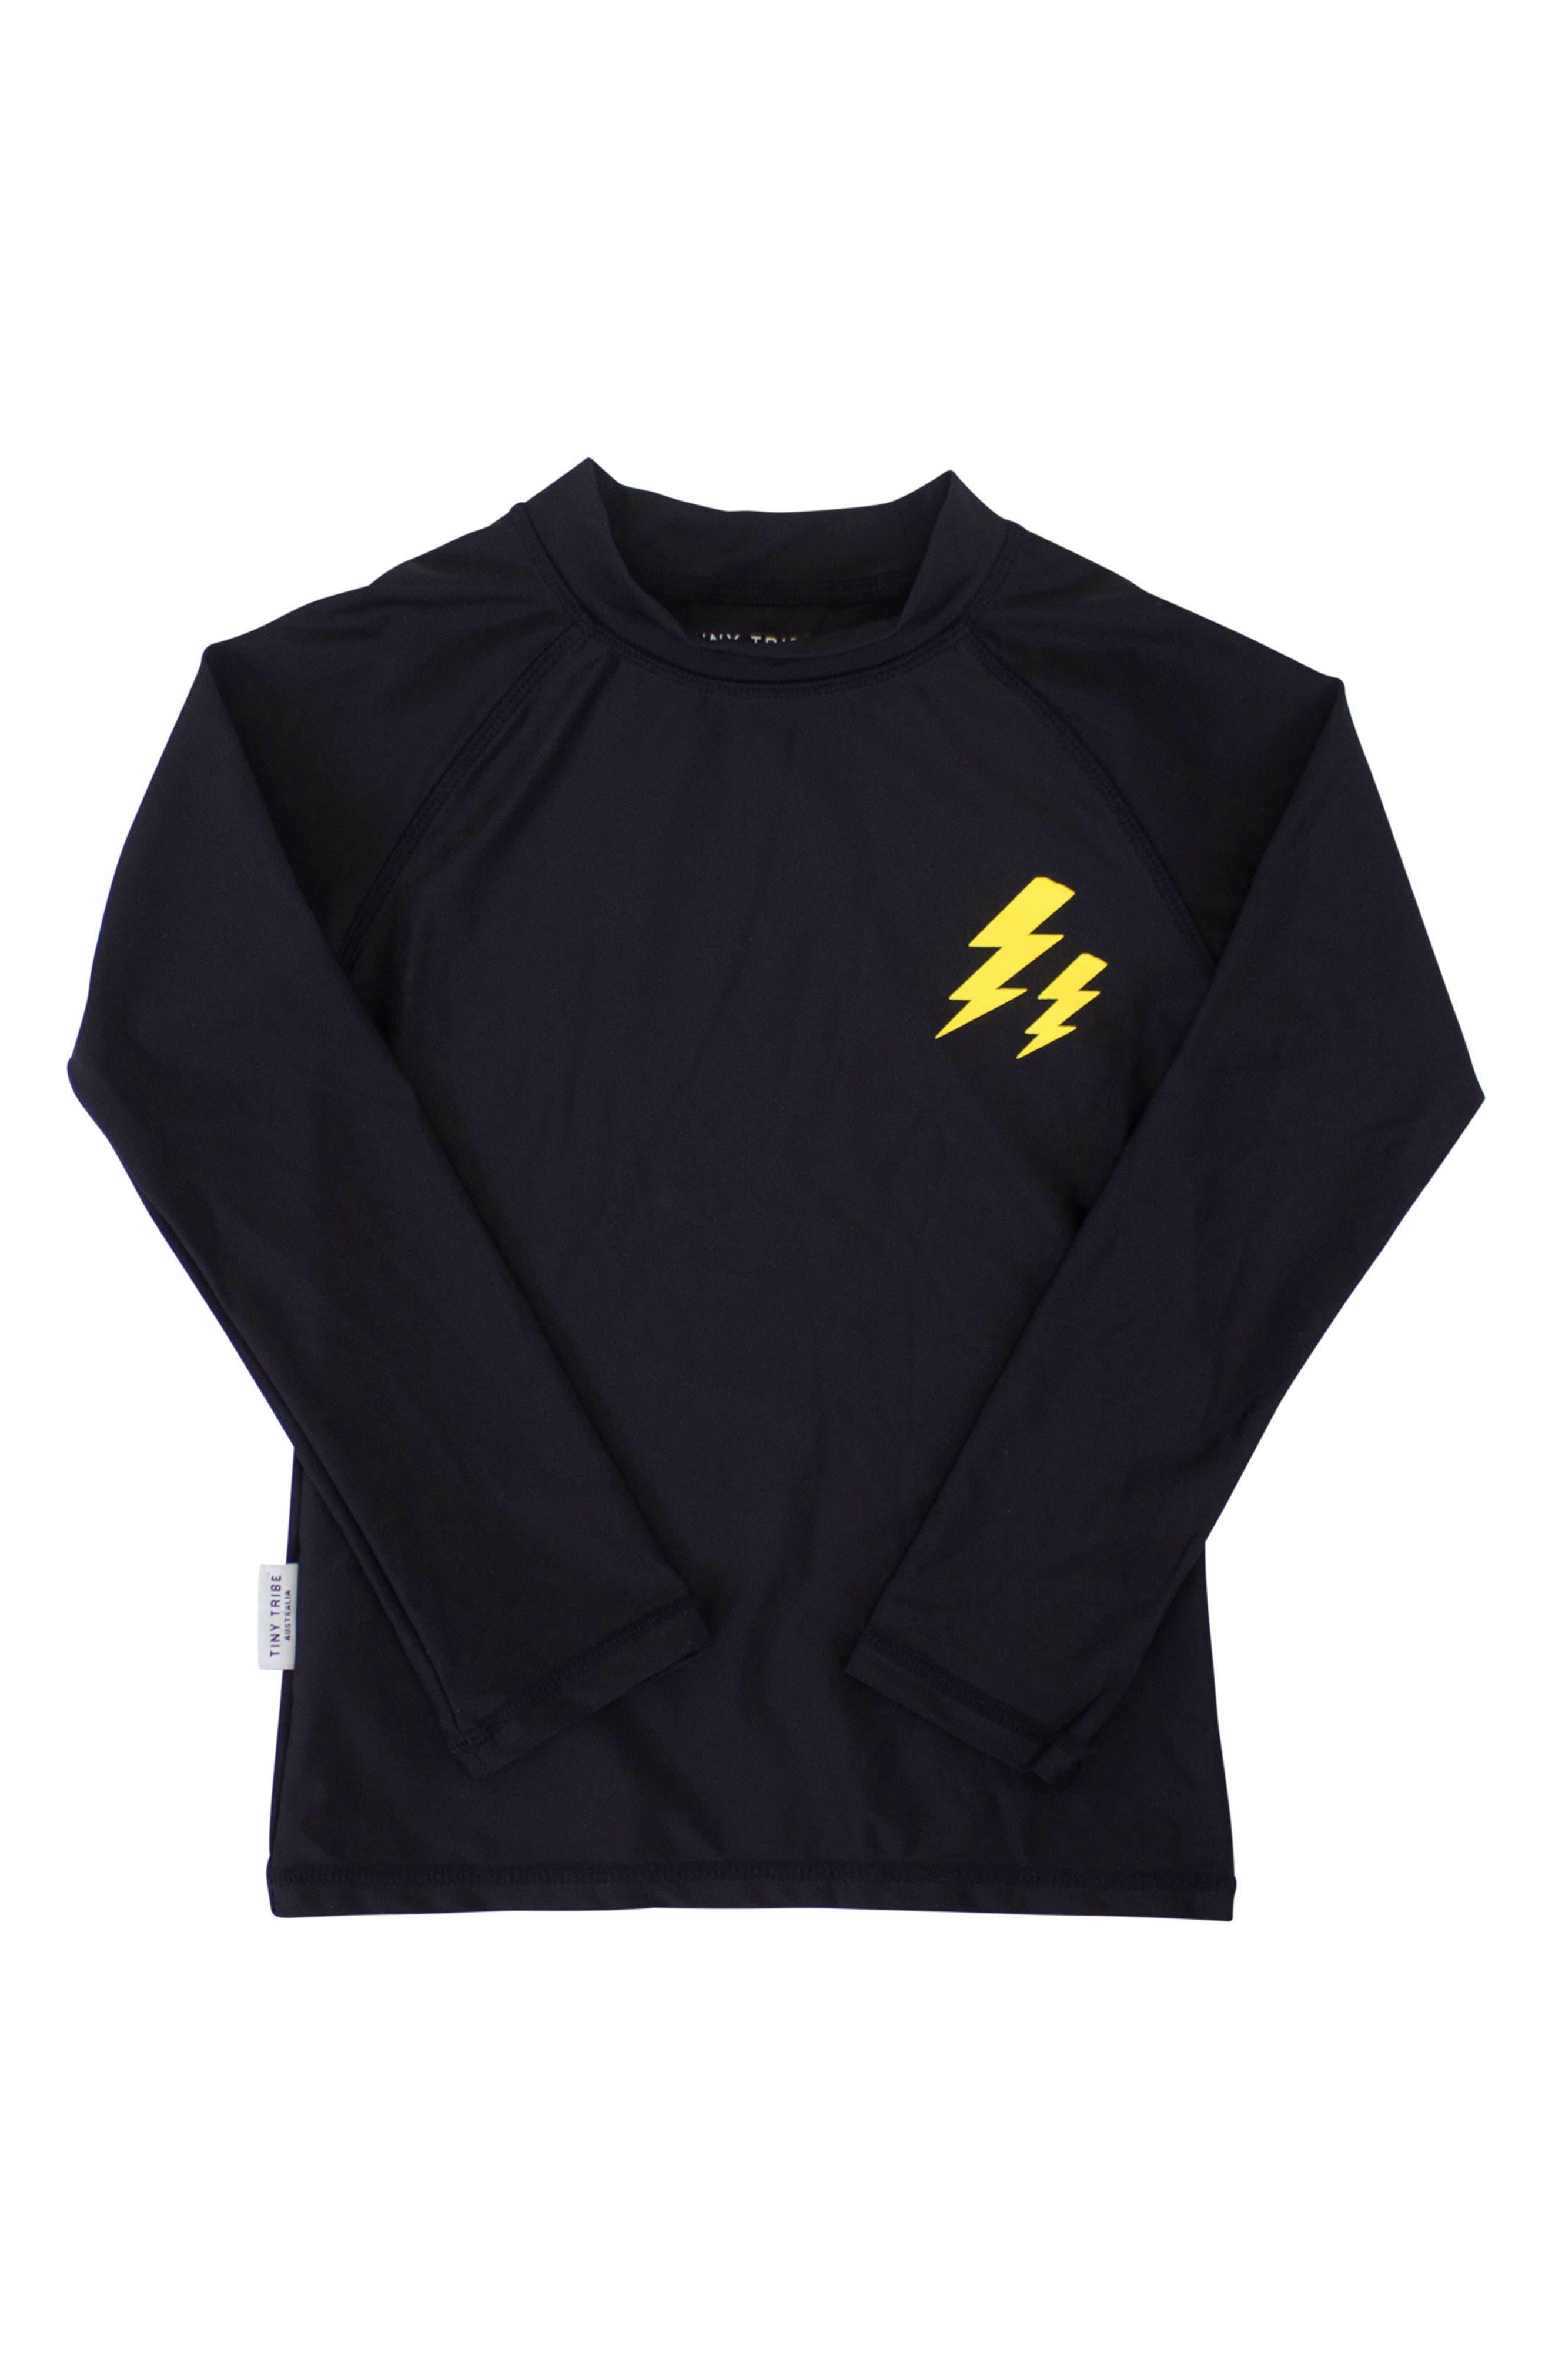 Electric Rashguard Top,                         Main,                         color, 001